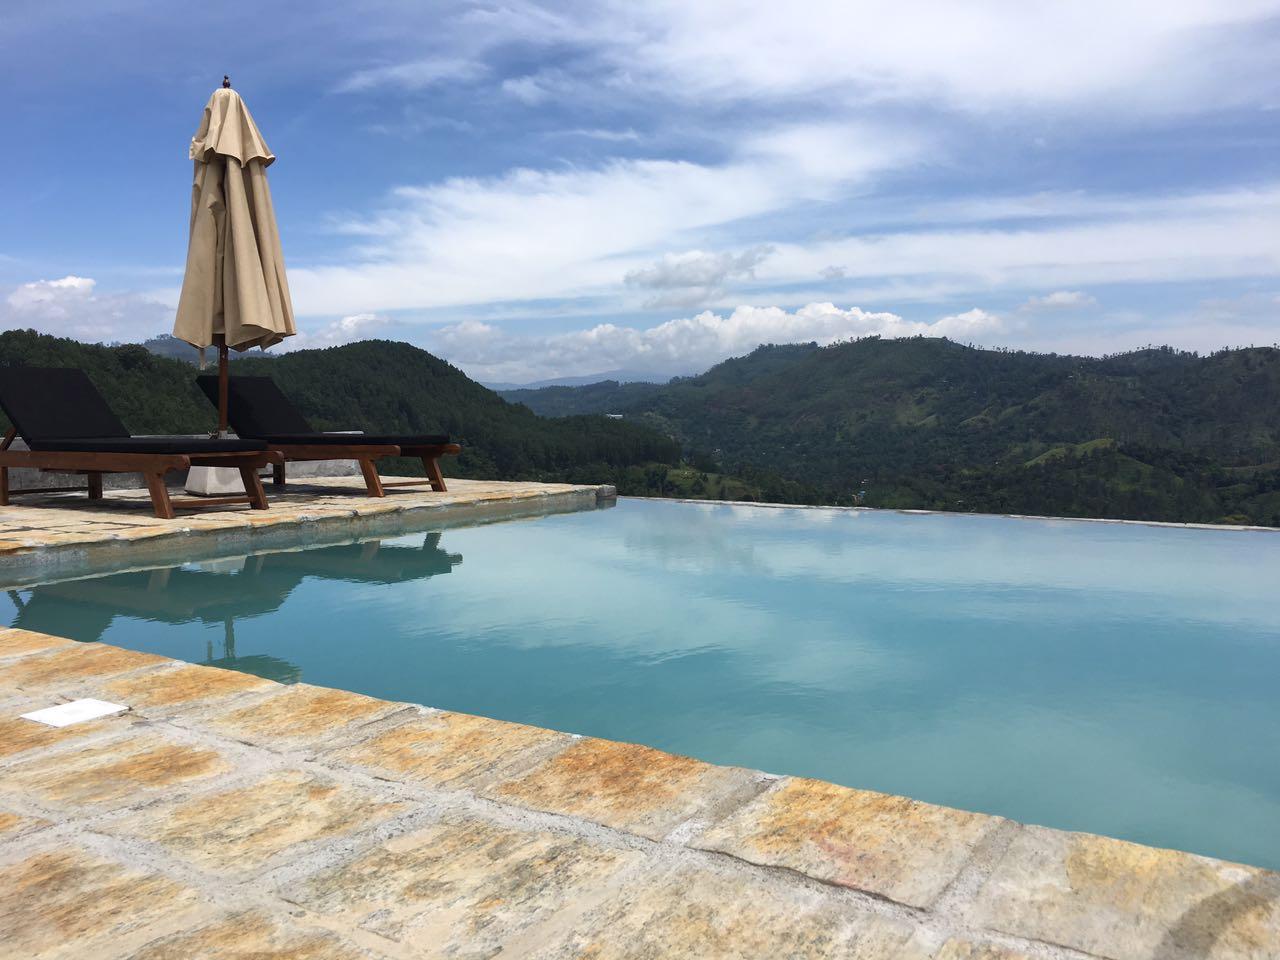 invite-to-paradise-sri-lanka-specialists-experts-travel-agent-tour-operator-secret-ella-15.jpg